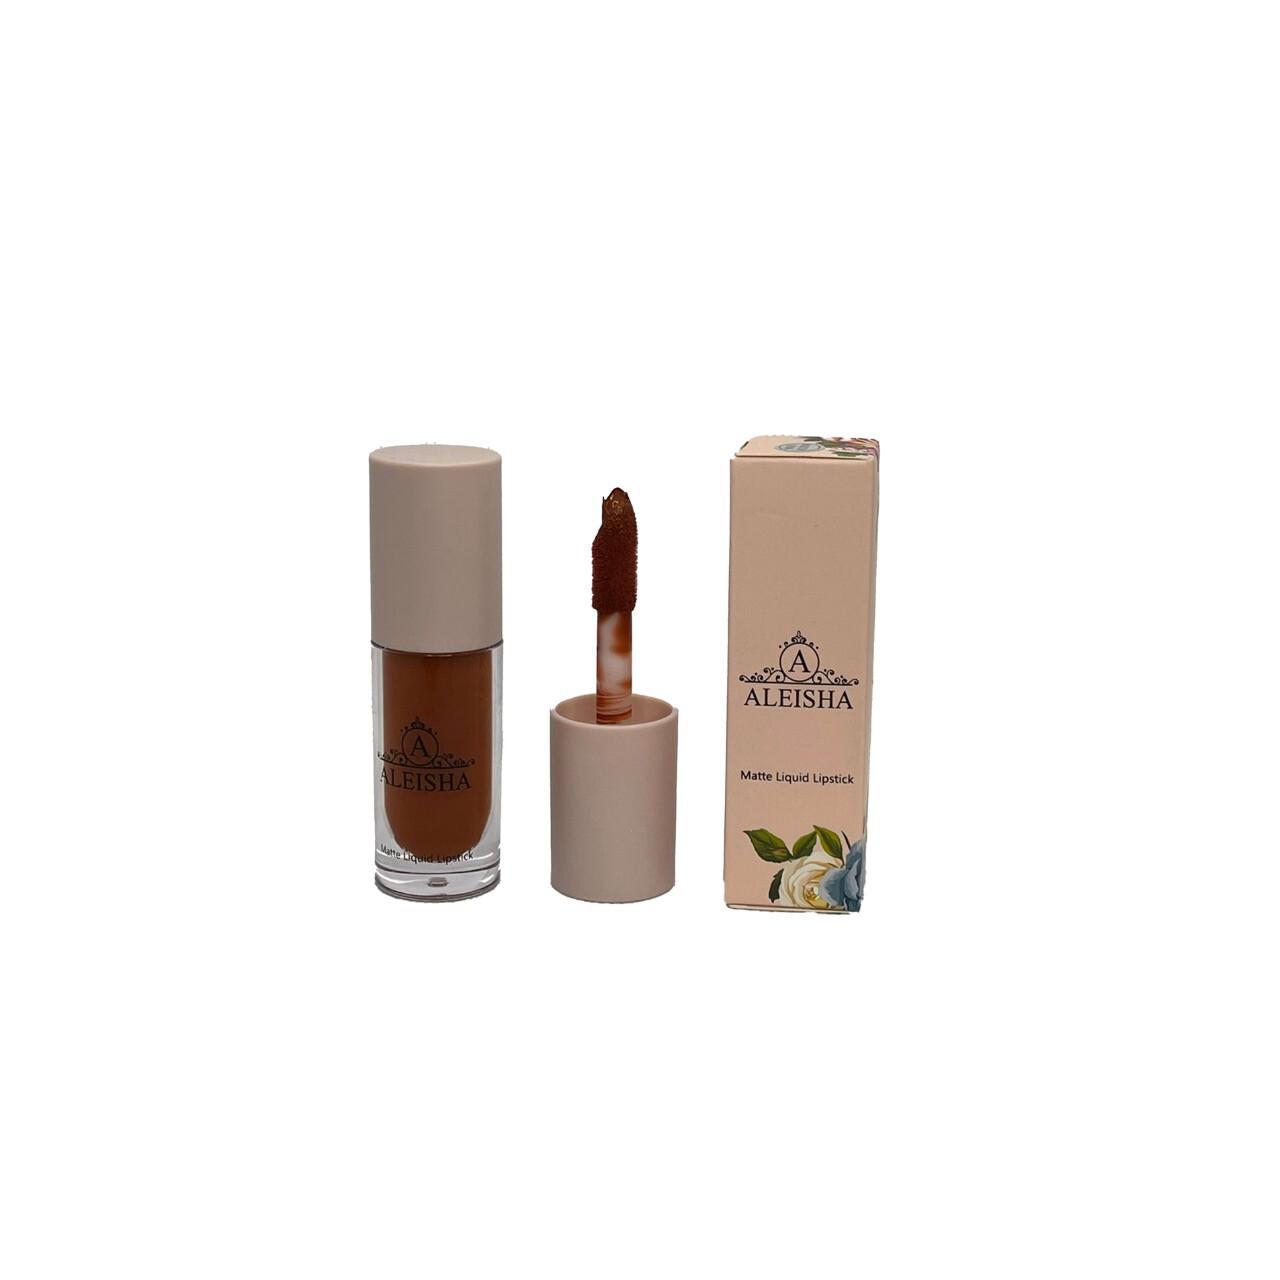 Hera Matte Liquid Lipsticks